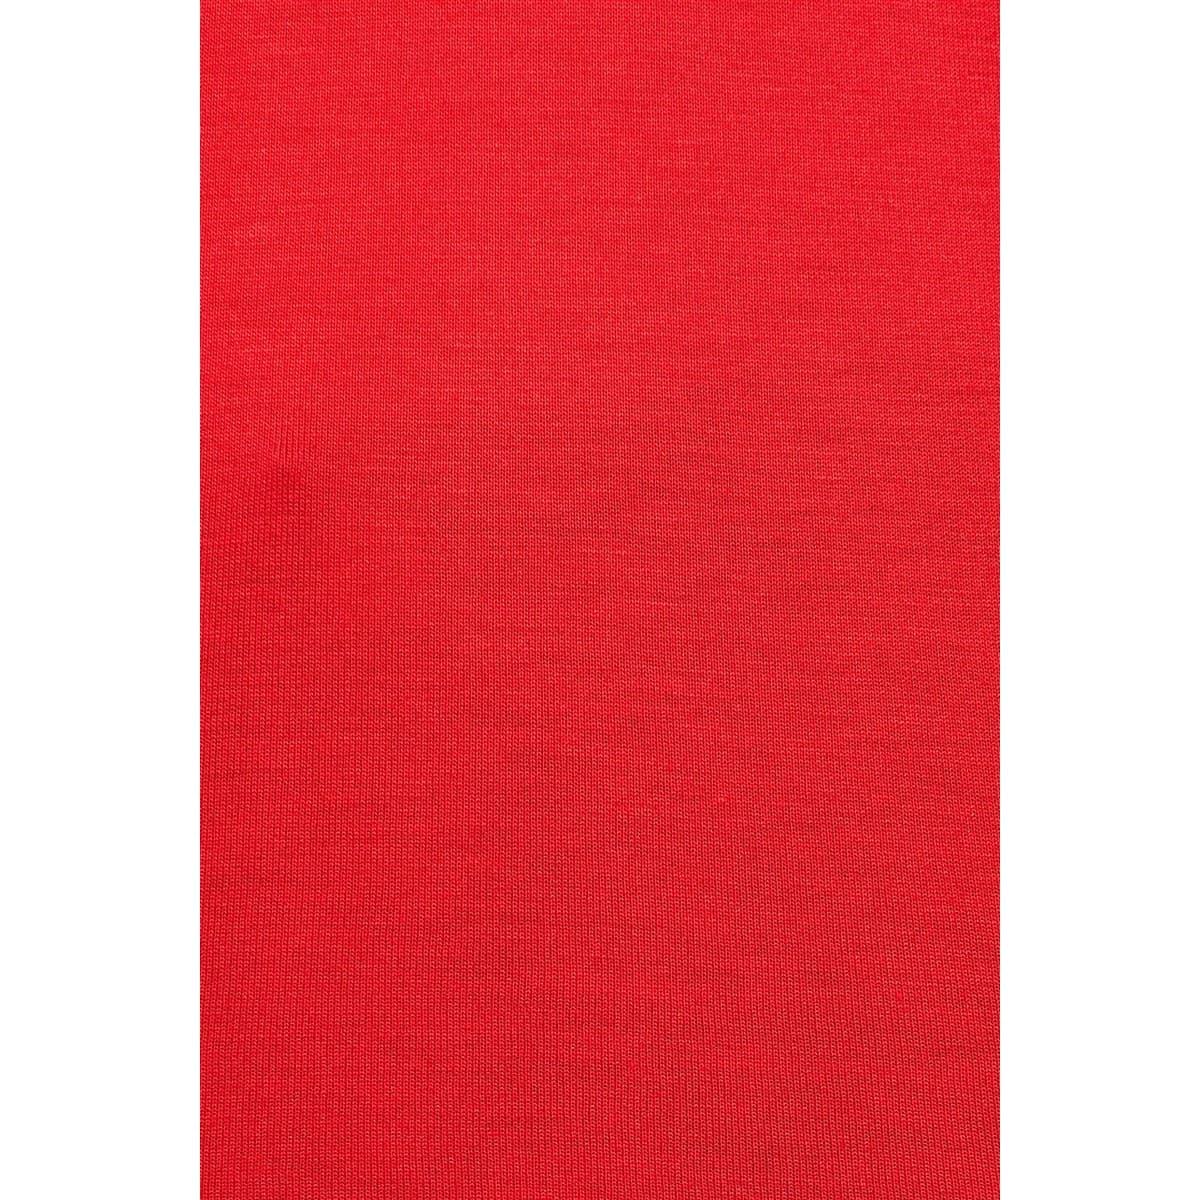 Kisa Kol Basic Penye Kırmızı